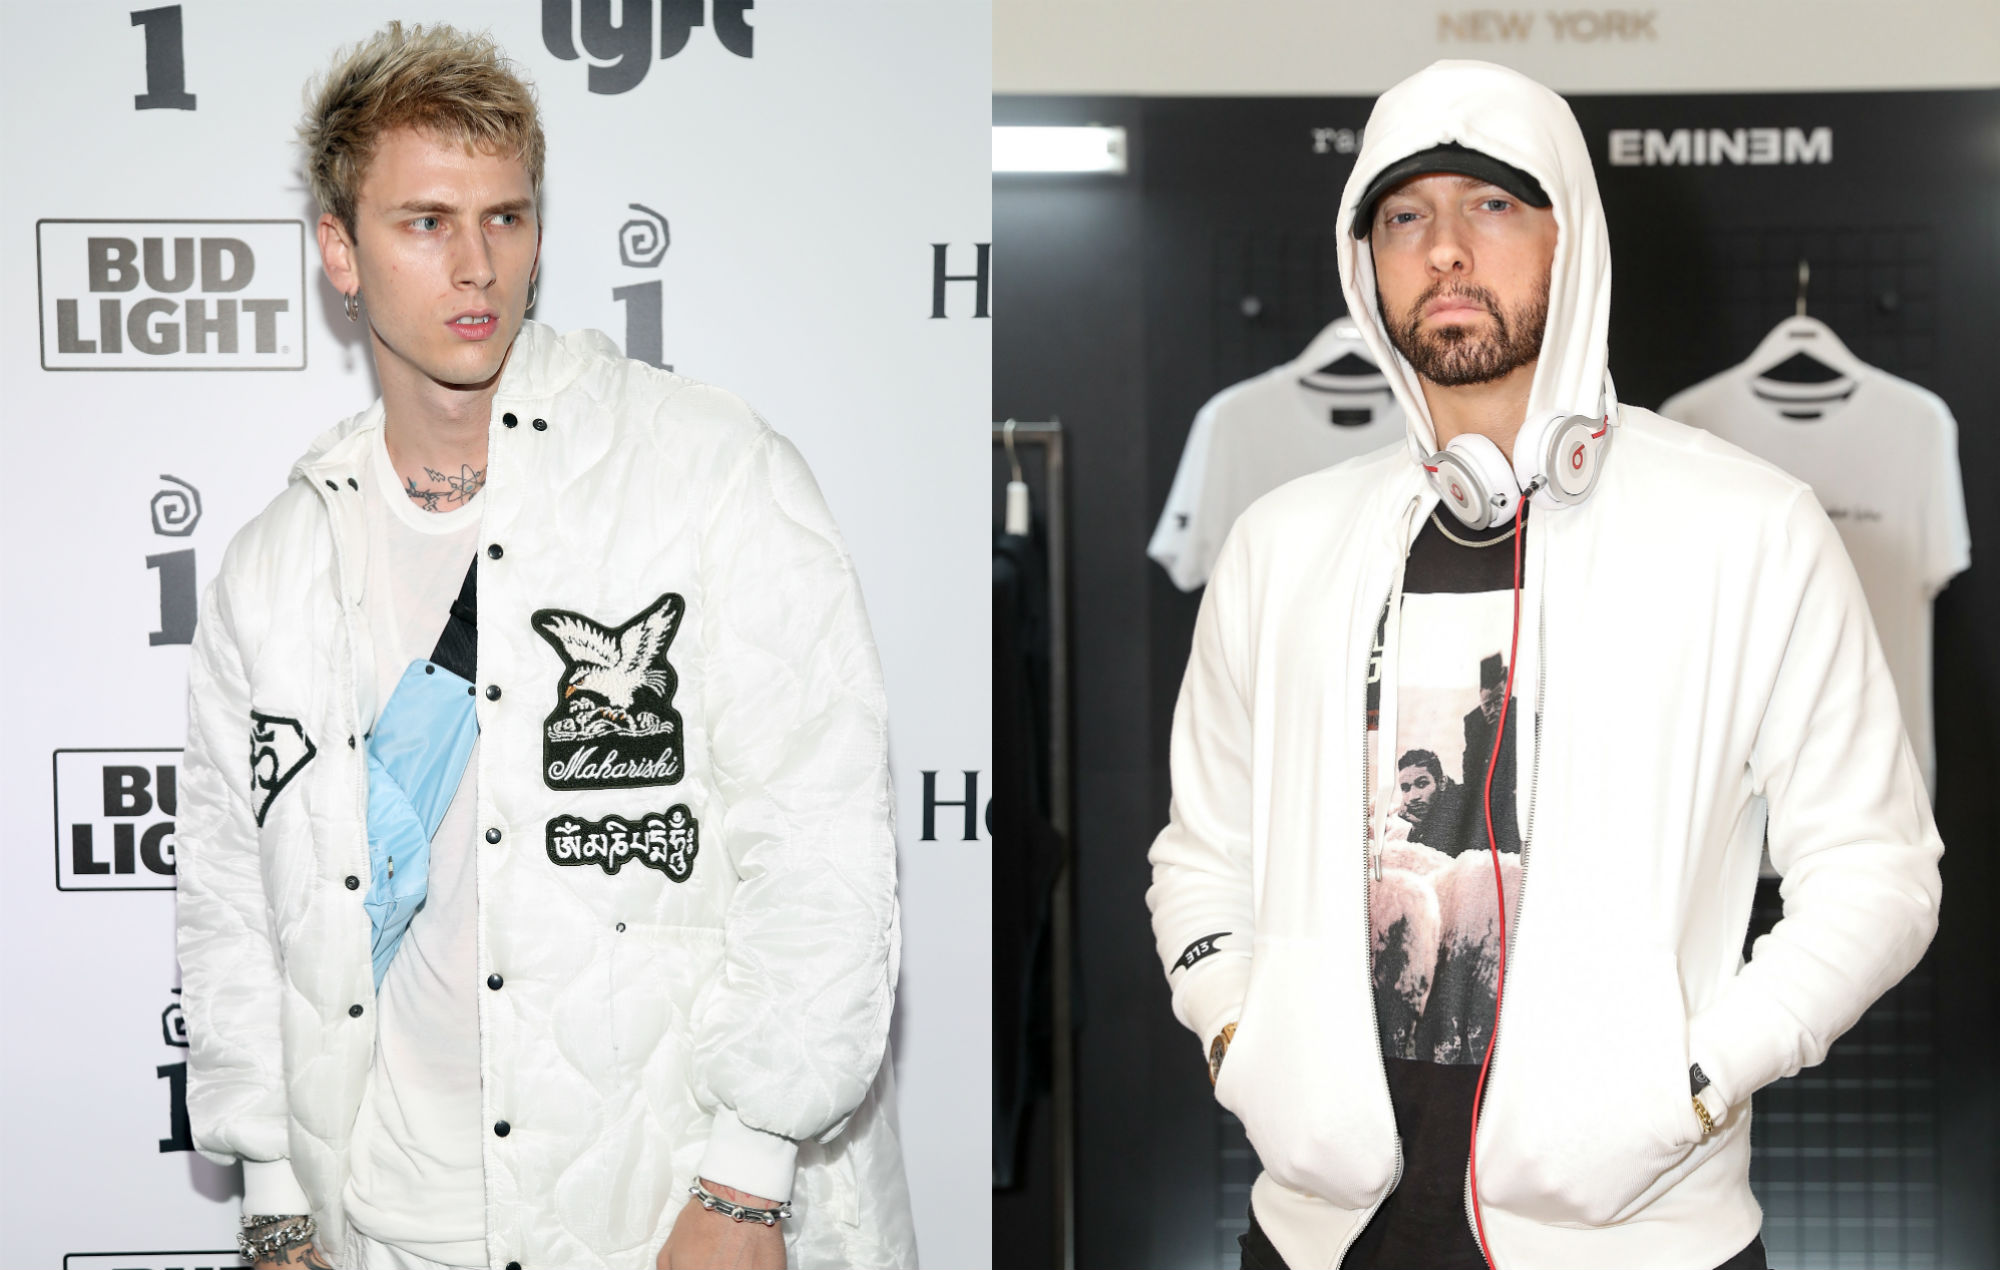 Machine Gun Kelly / Eminem